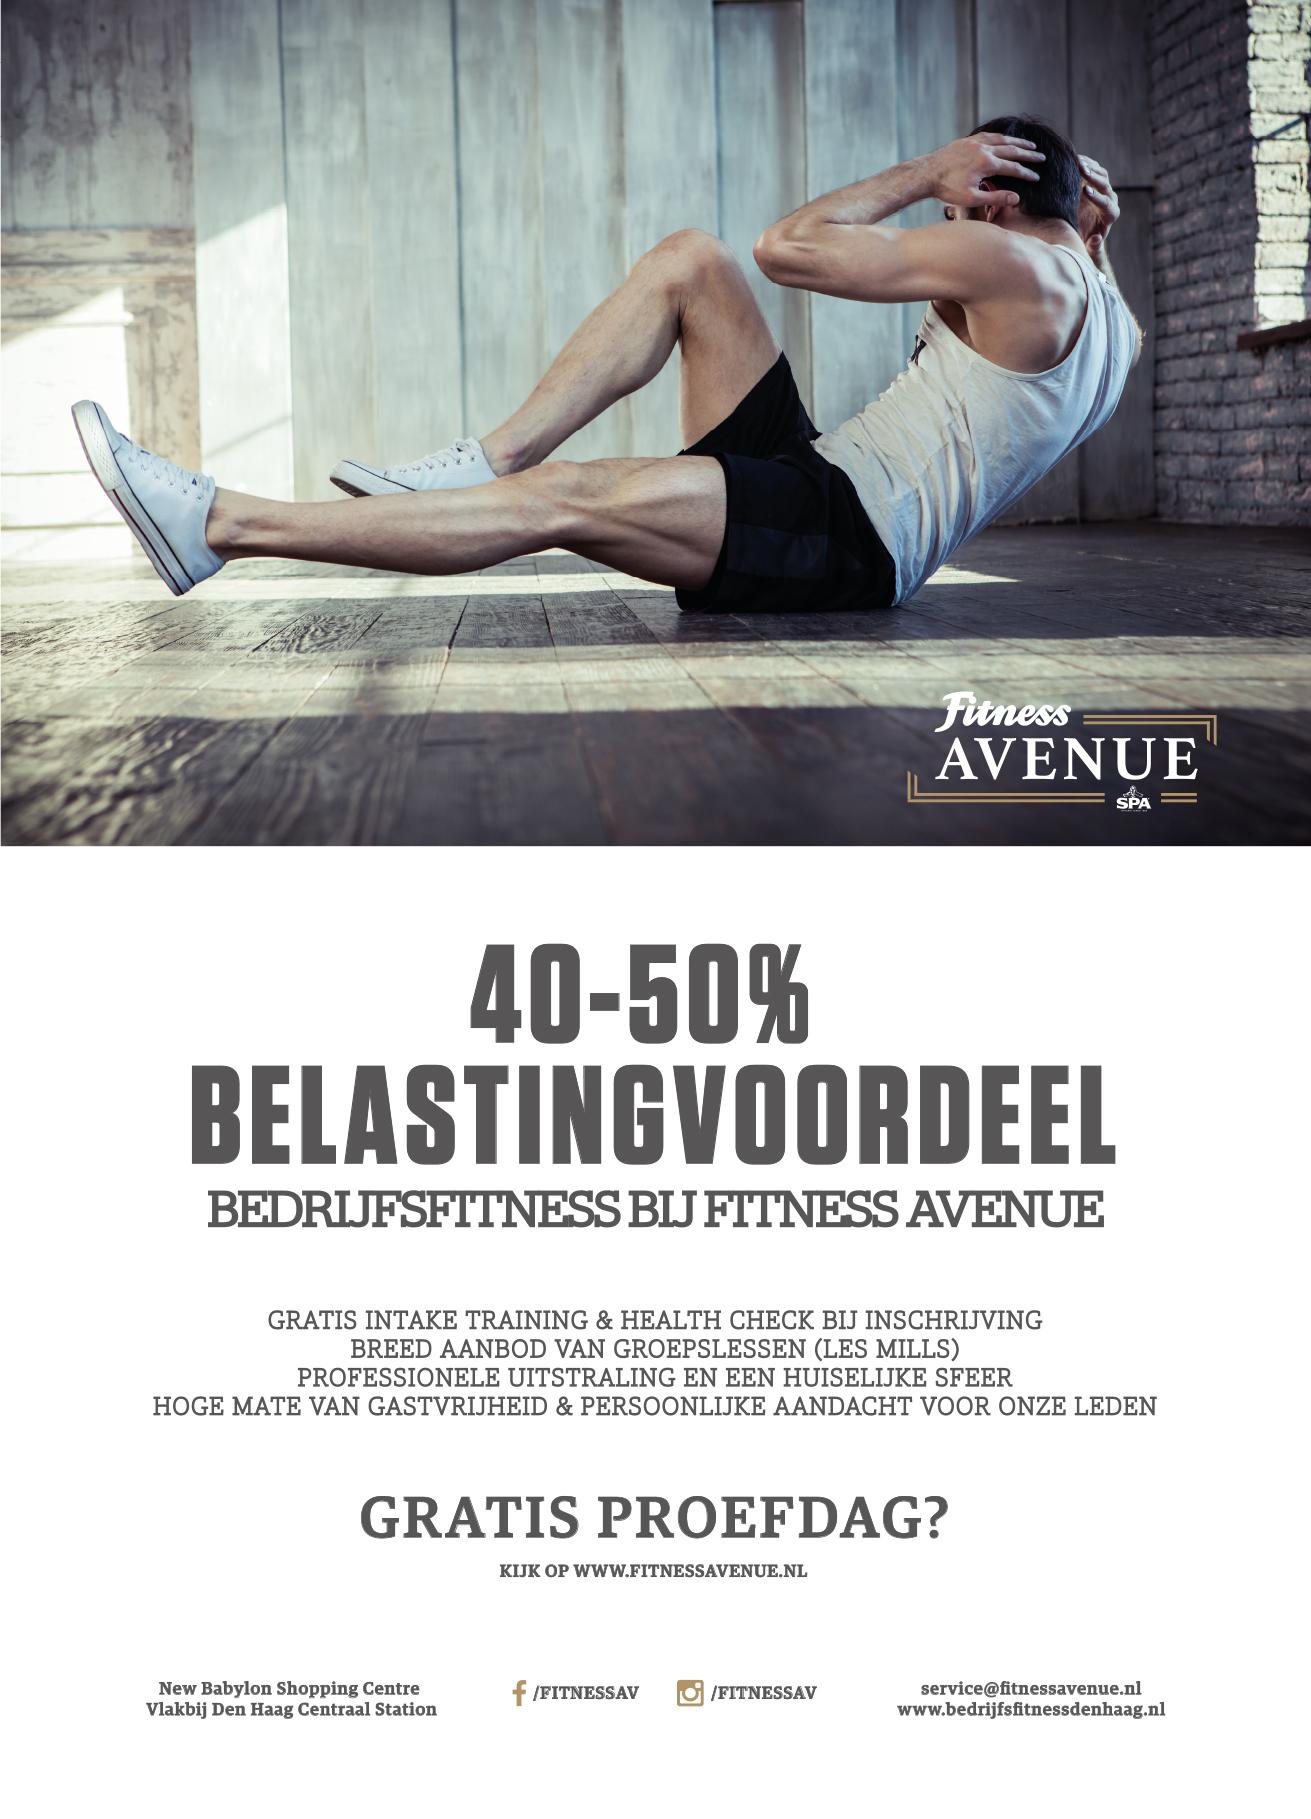 Bedrijfsfitness poster Fitness Avenue.jpg